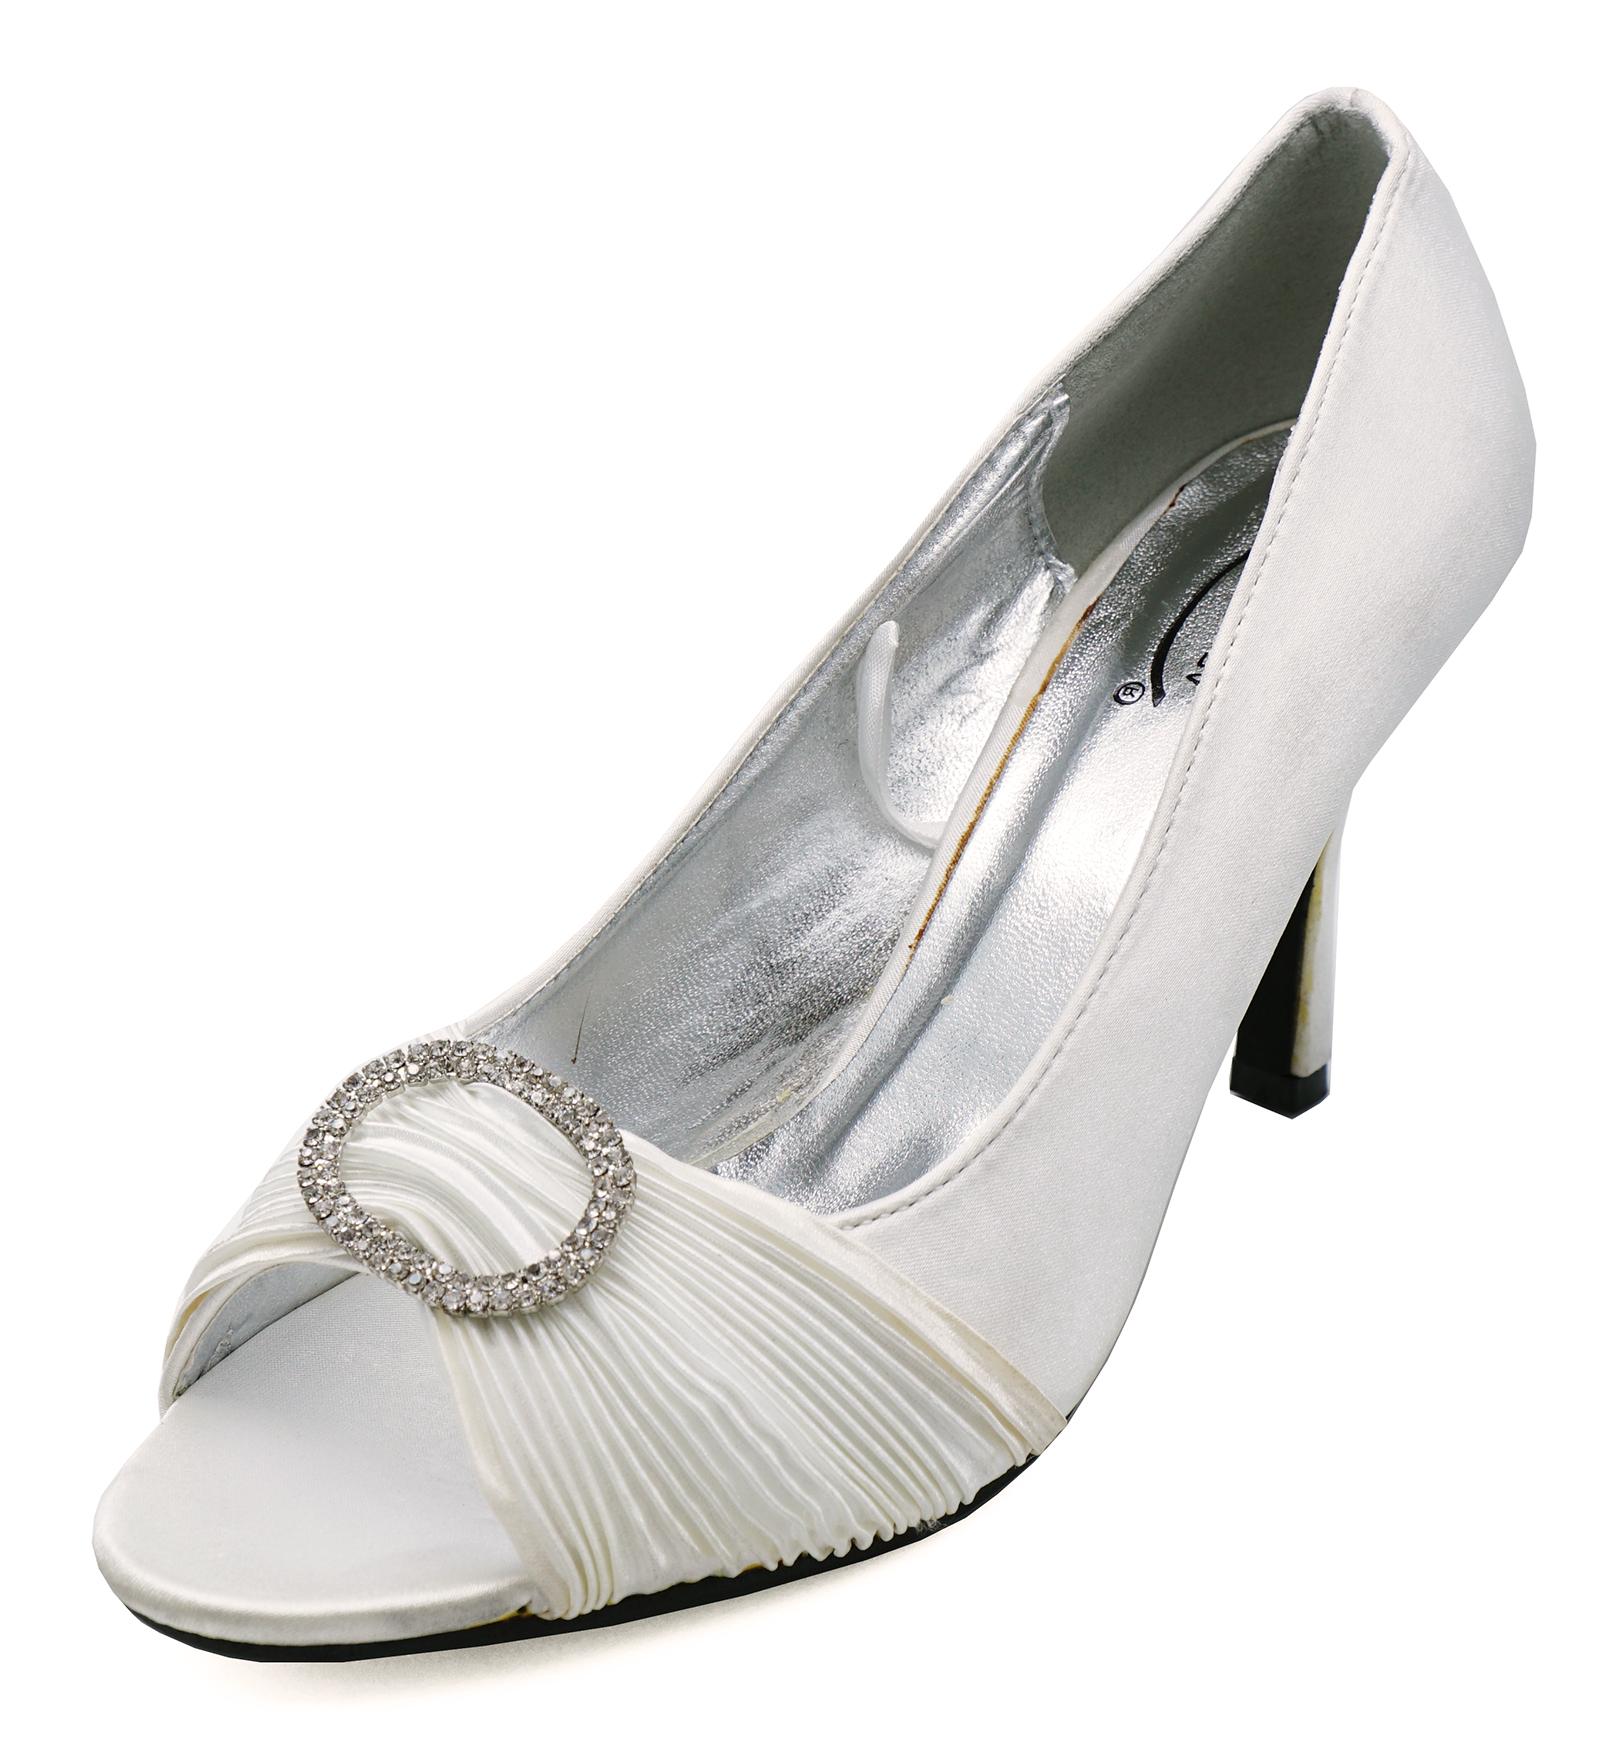 Mujer Marfil Raso Nupcial Novia Dama Boda Tribunal Zapatos 3-8 segundos